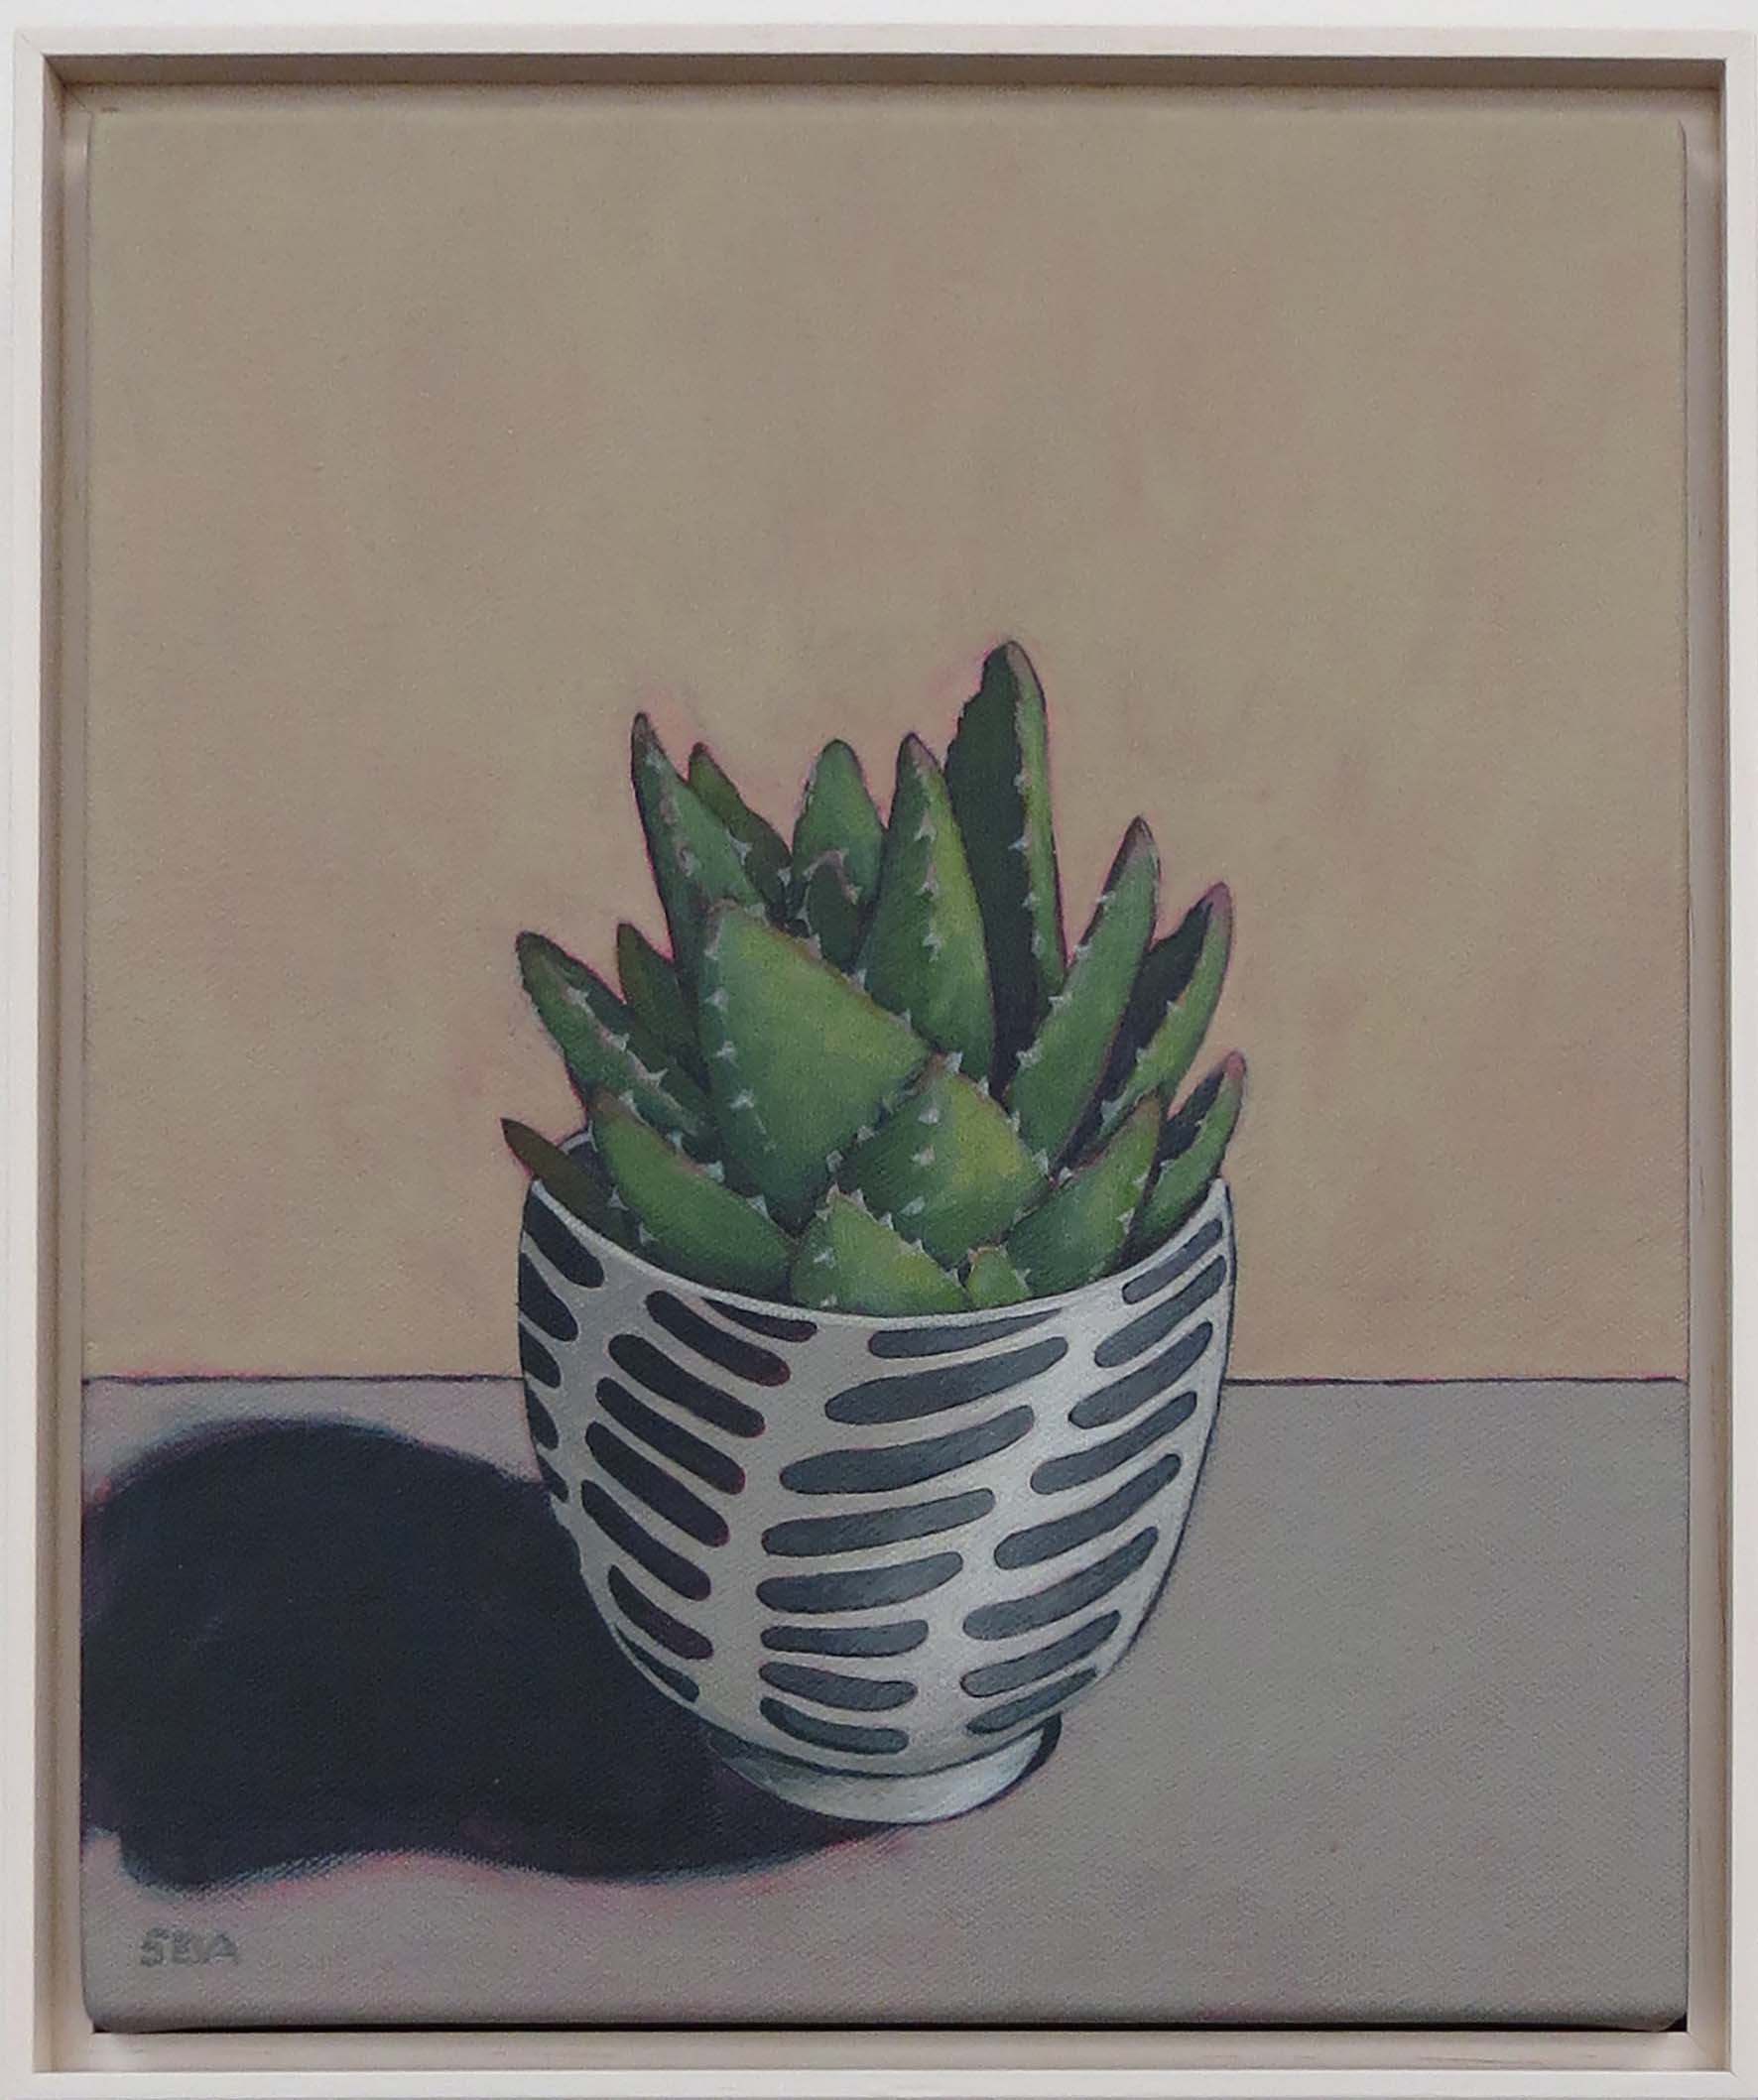 6. Sue Eva, 'Black, White, Aloe', 2018, Acrylic on canvas, 30 x 25cm, $345